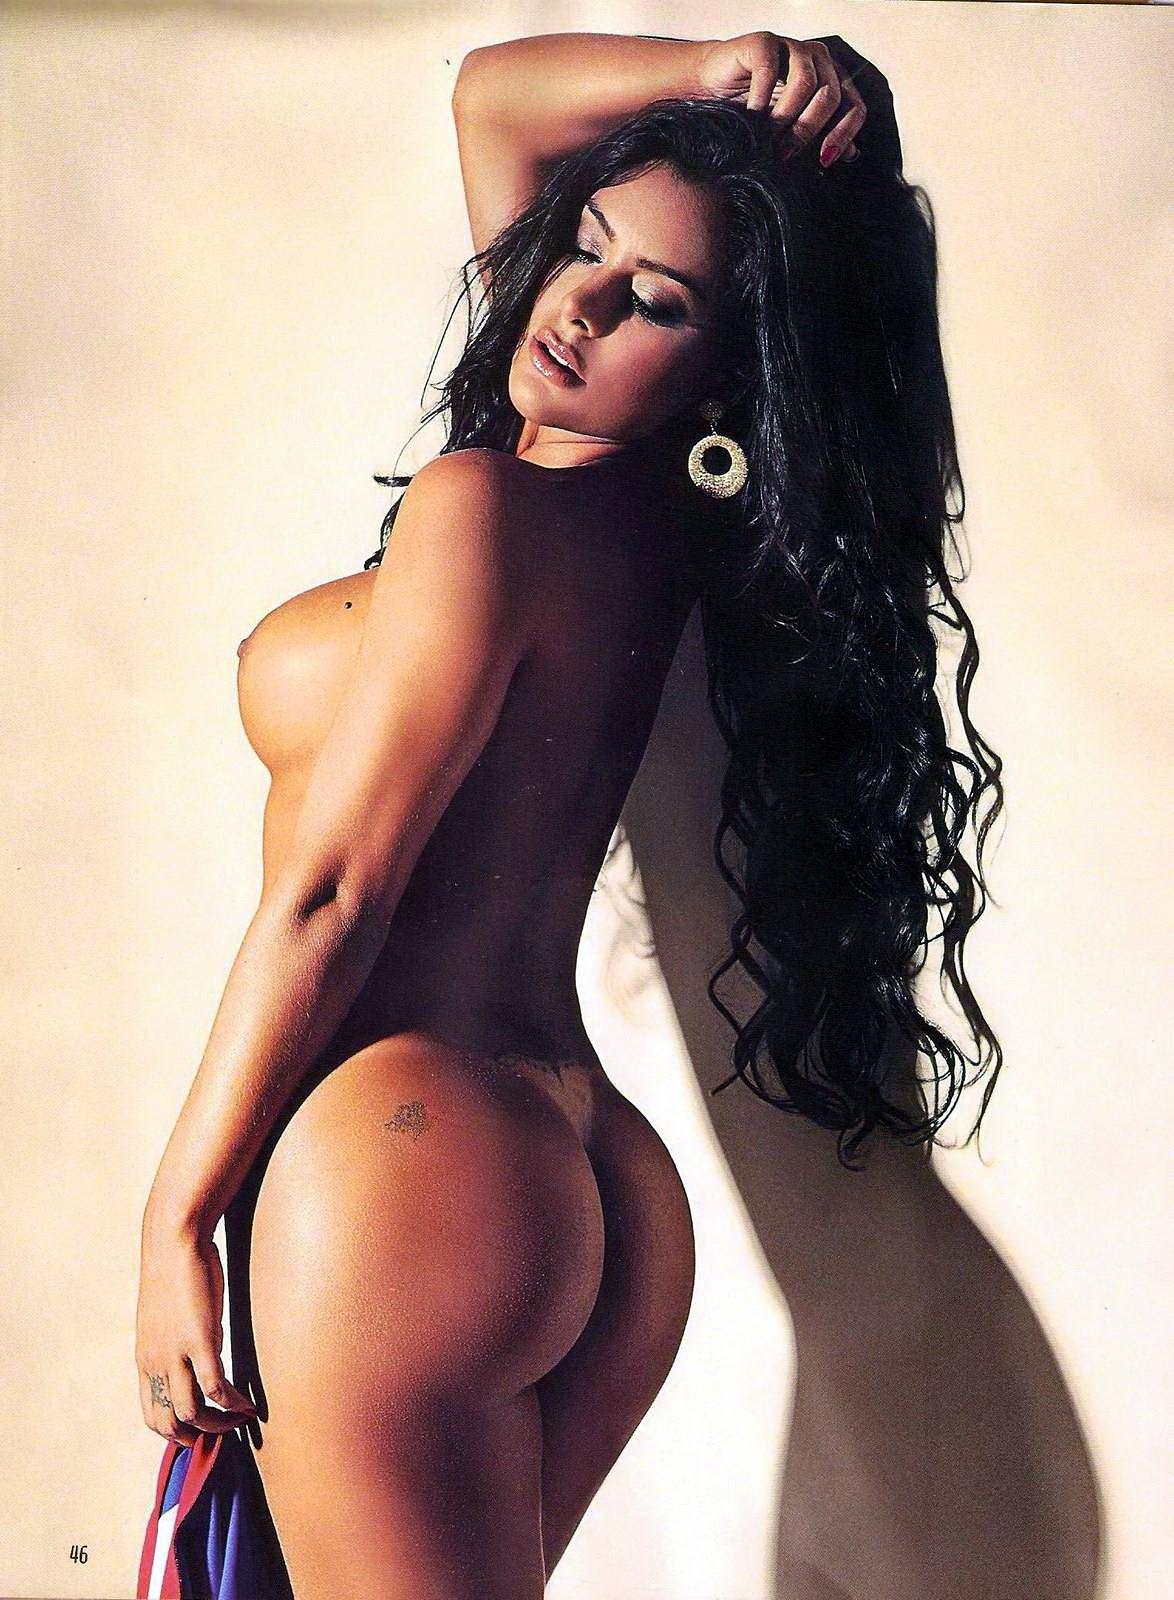 This remarkable Larissa riquelme sexy